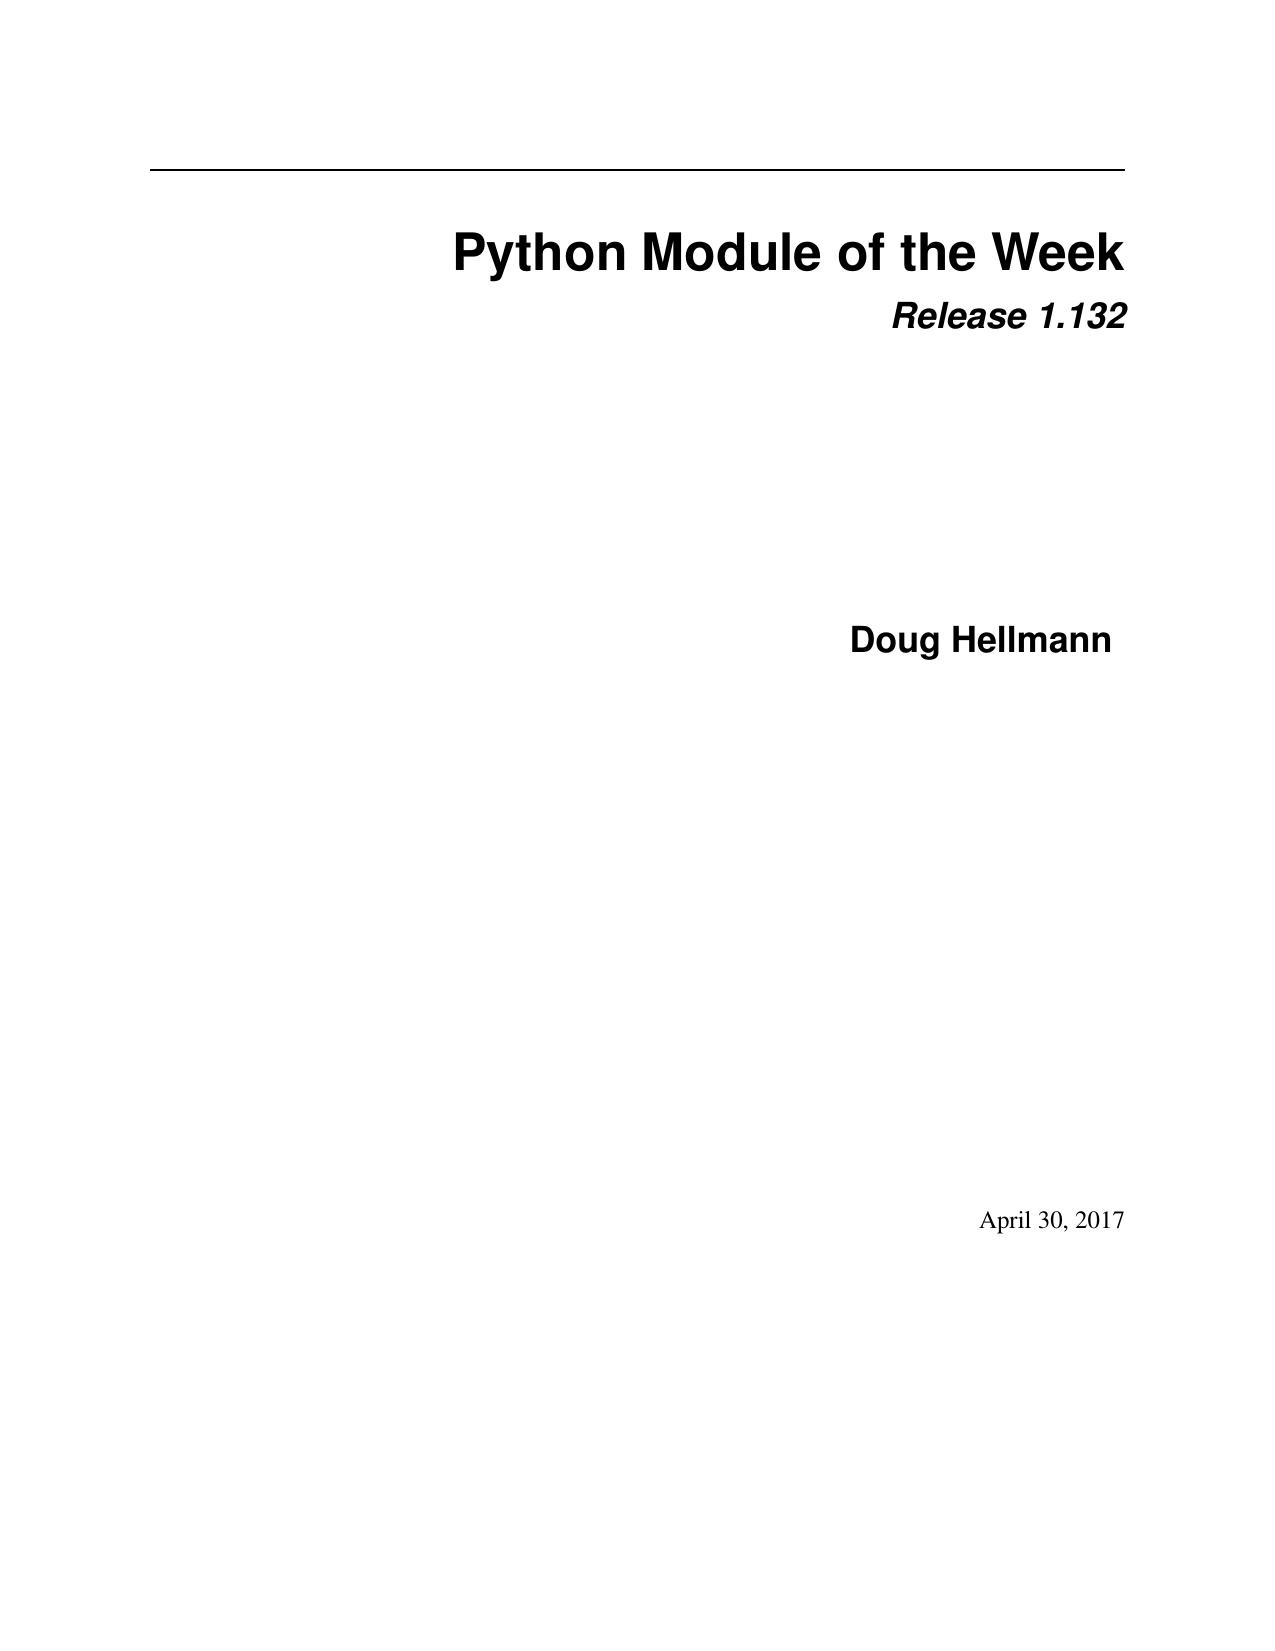 Python Module of the Week Release 1 132 Doug Hellmann